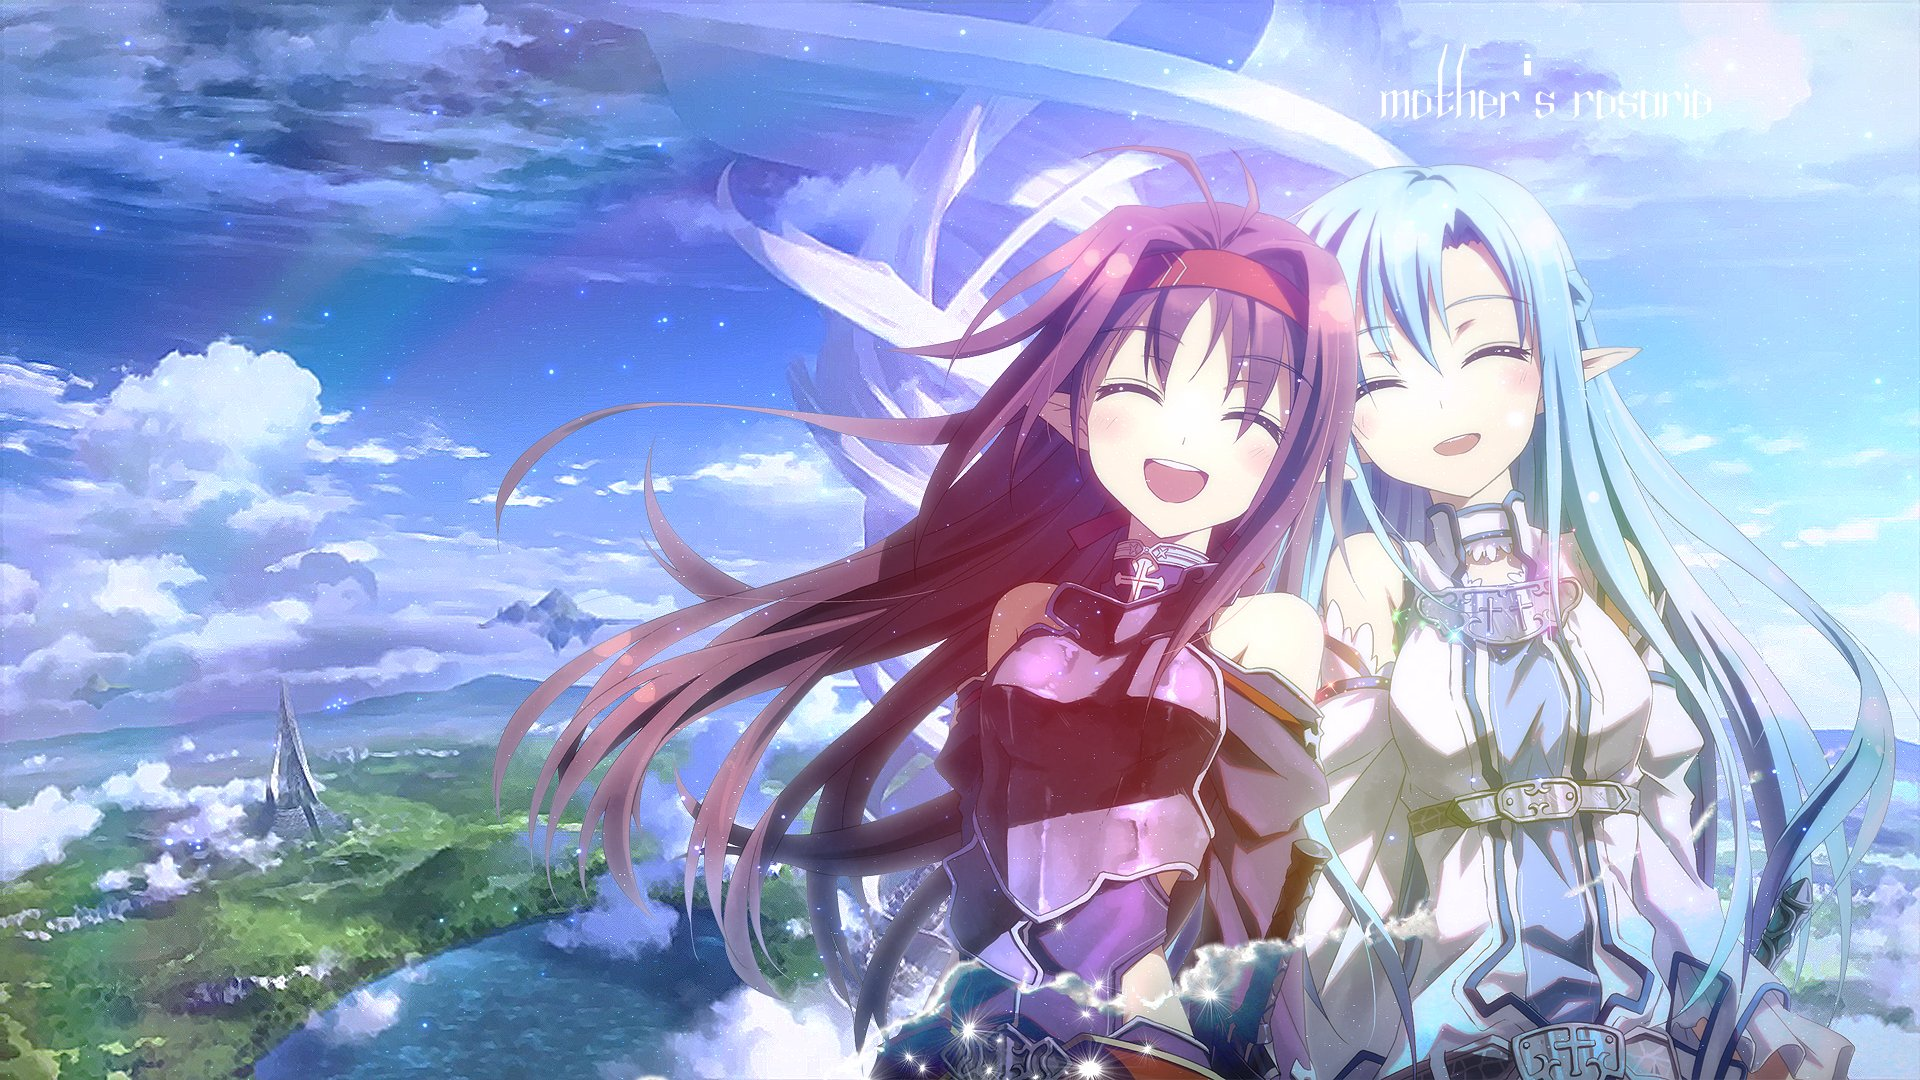 Asuna and Yuuki HD Wallpaper Background Image 1920x1080 ID 1920x1080